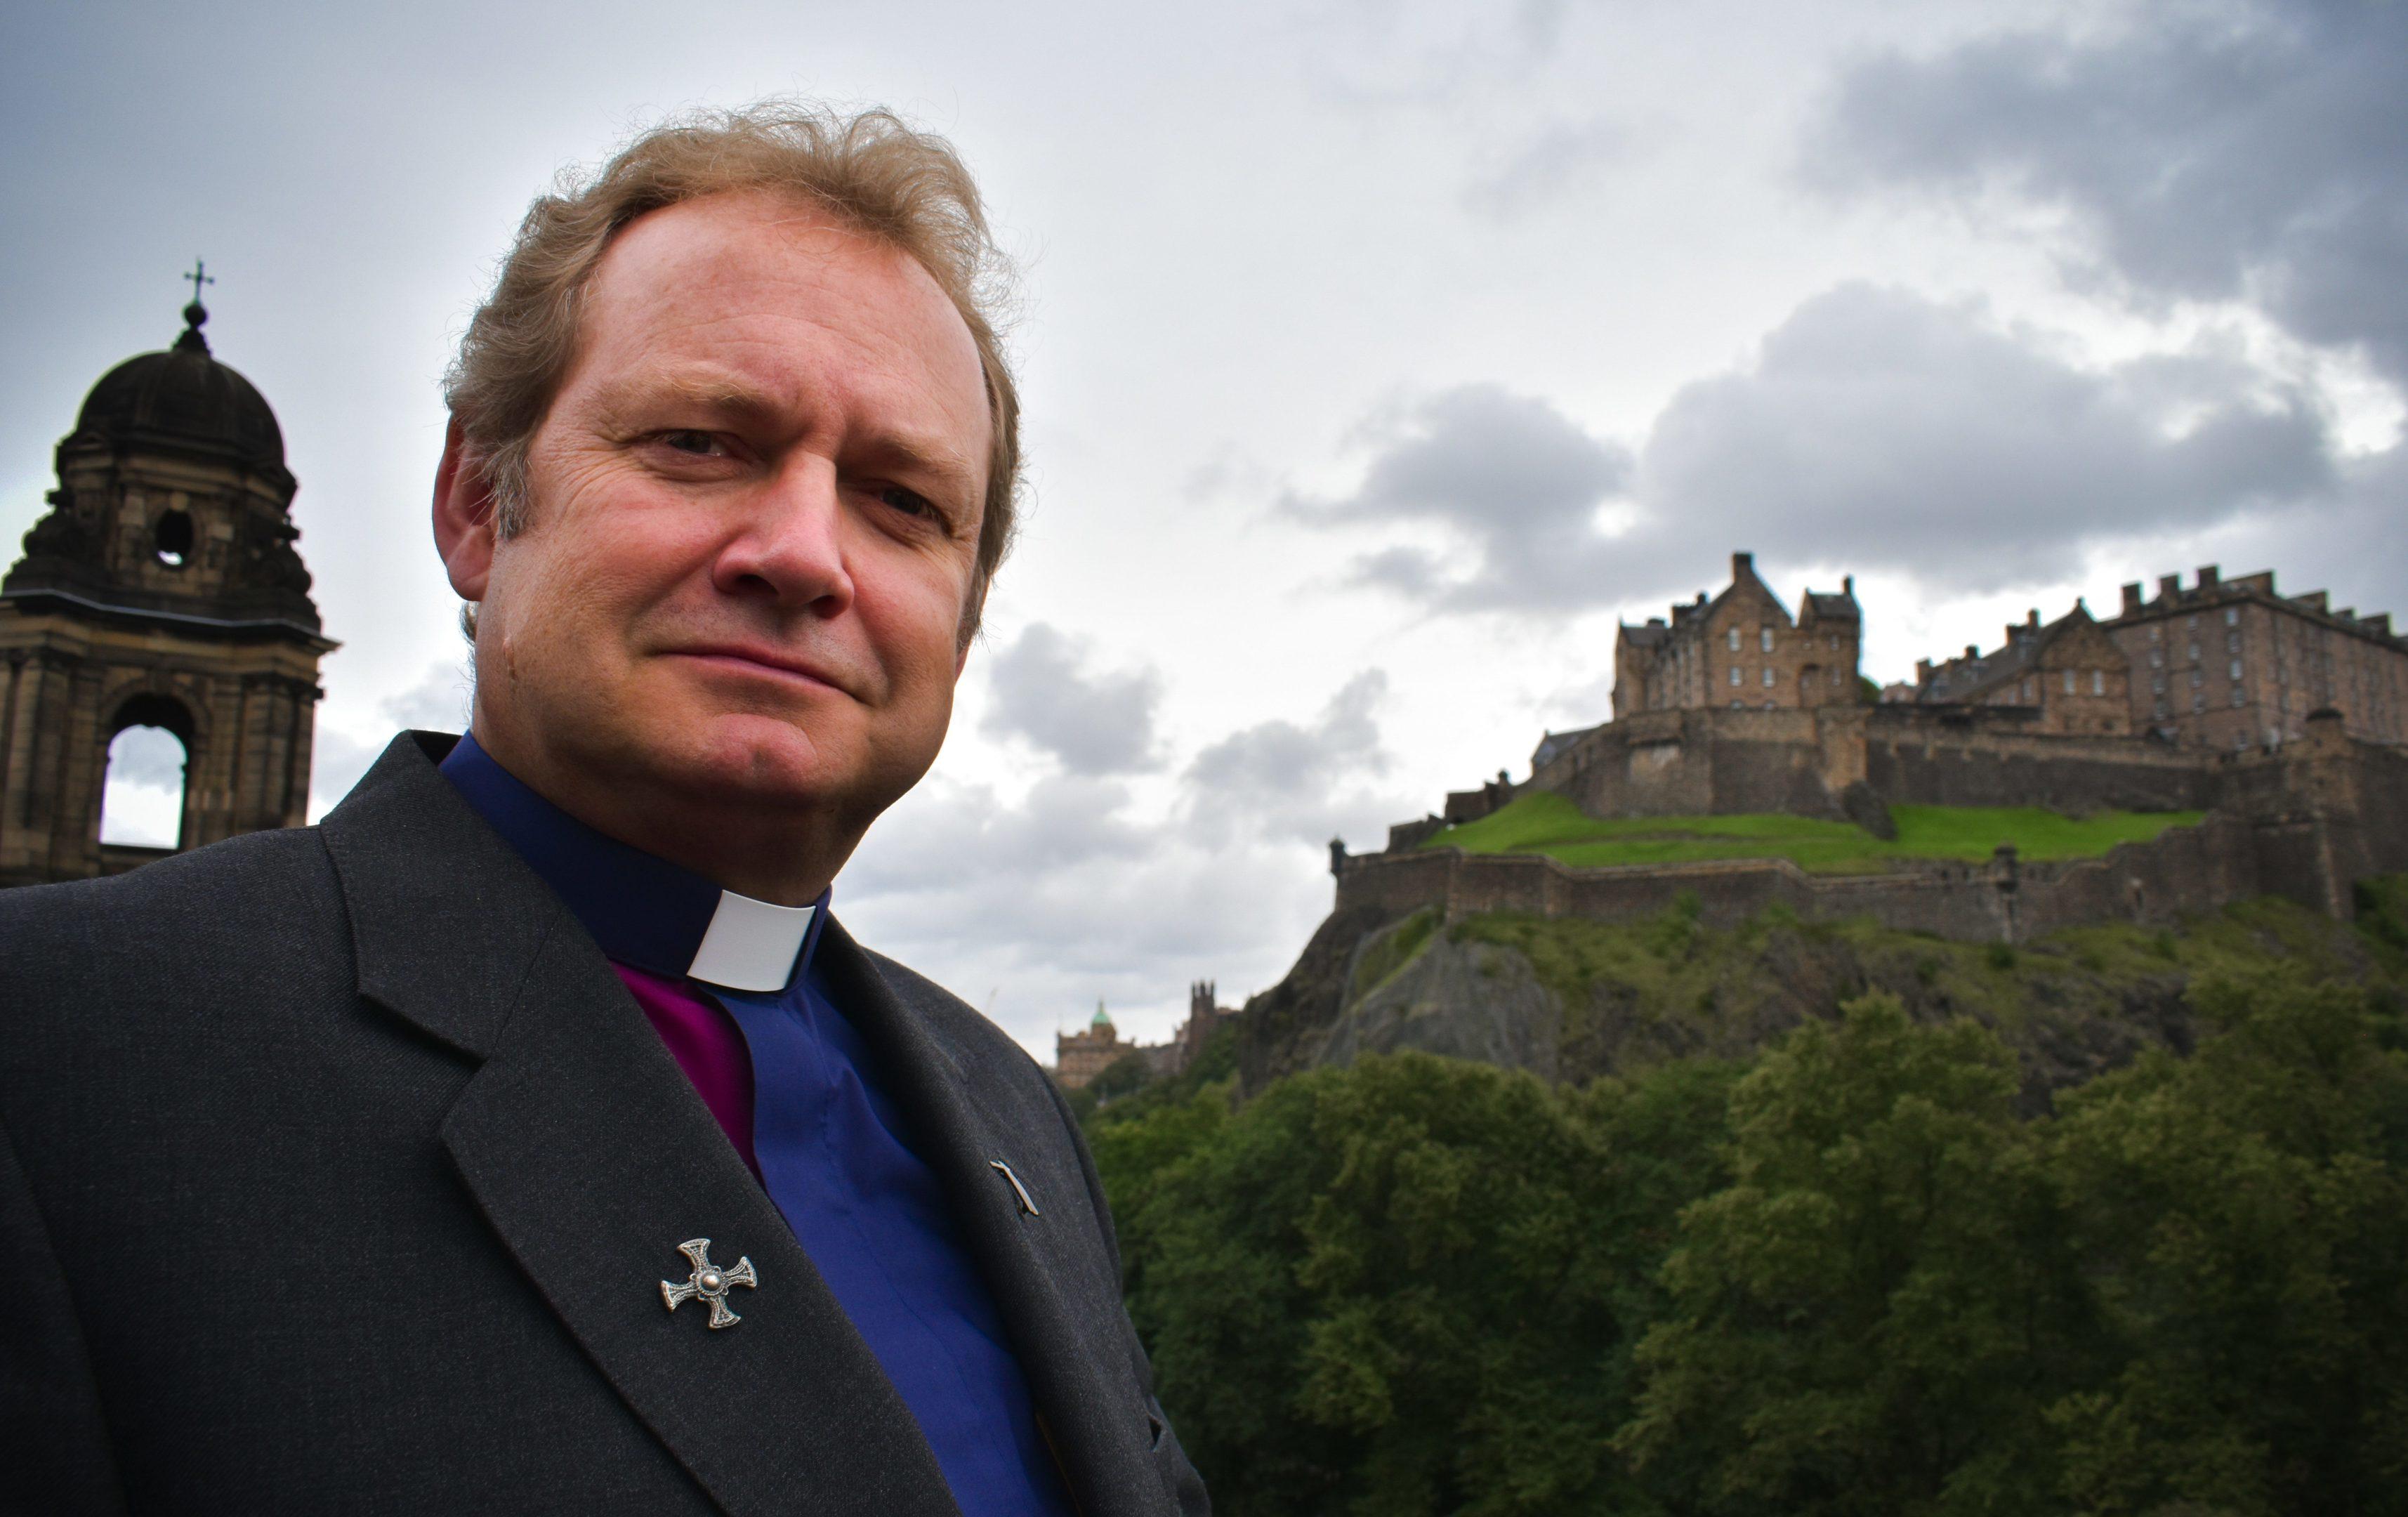 The Rev Peter Sutton